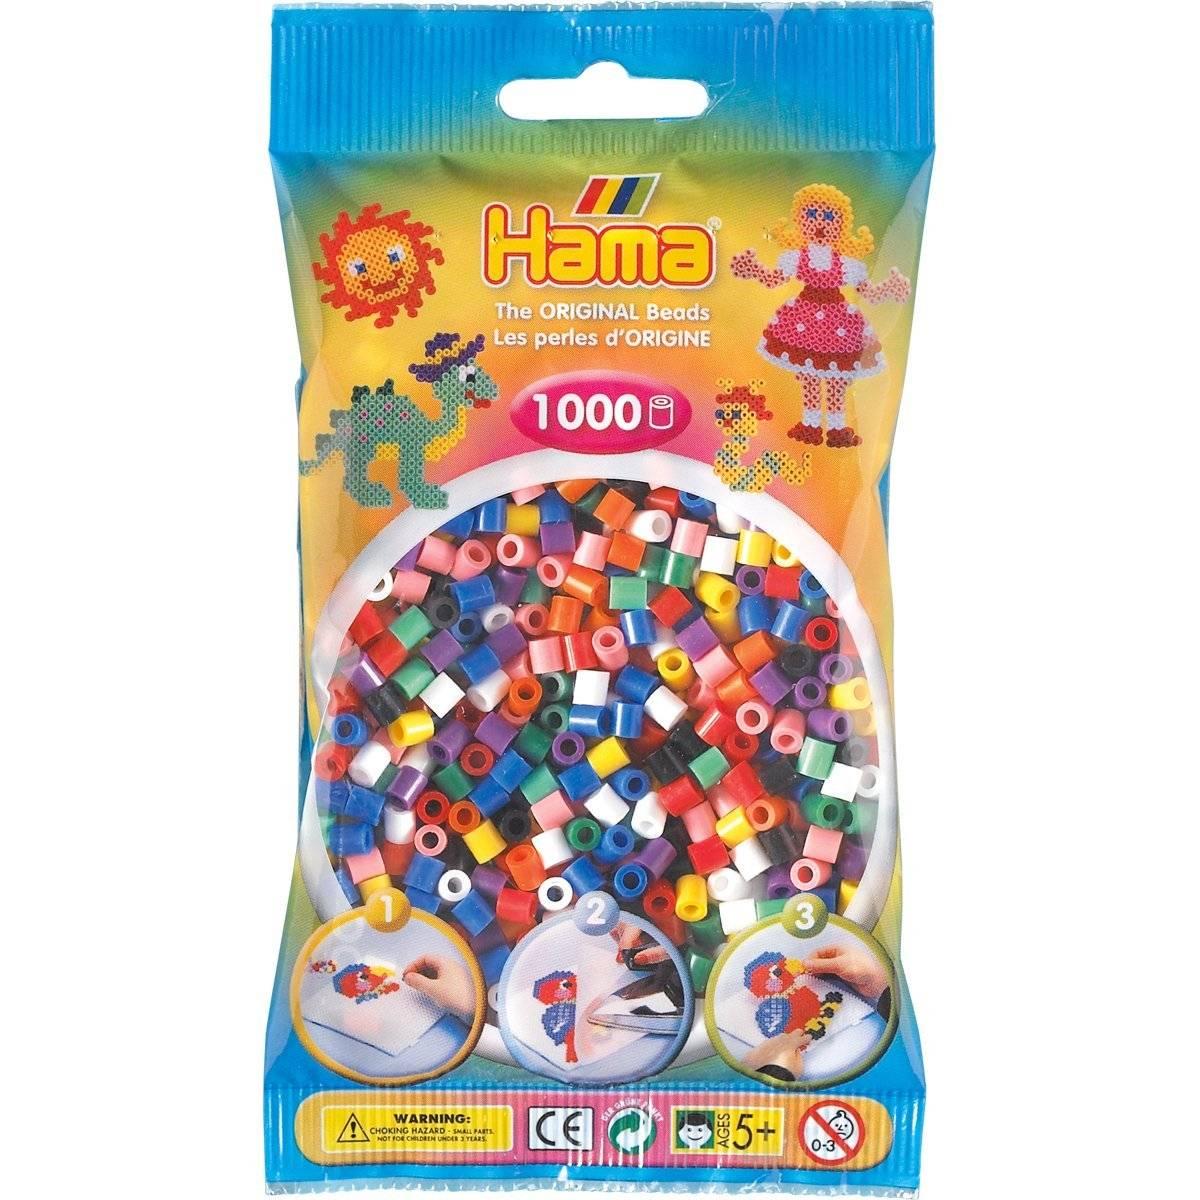 hama-beads-207-00-solid-mix-79fe6b463f659e2c17817320607d6e7849234ee5.jpeg